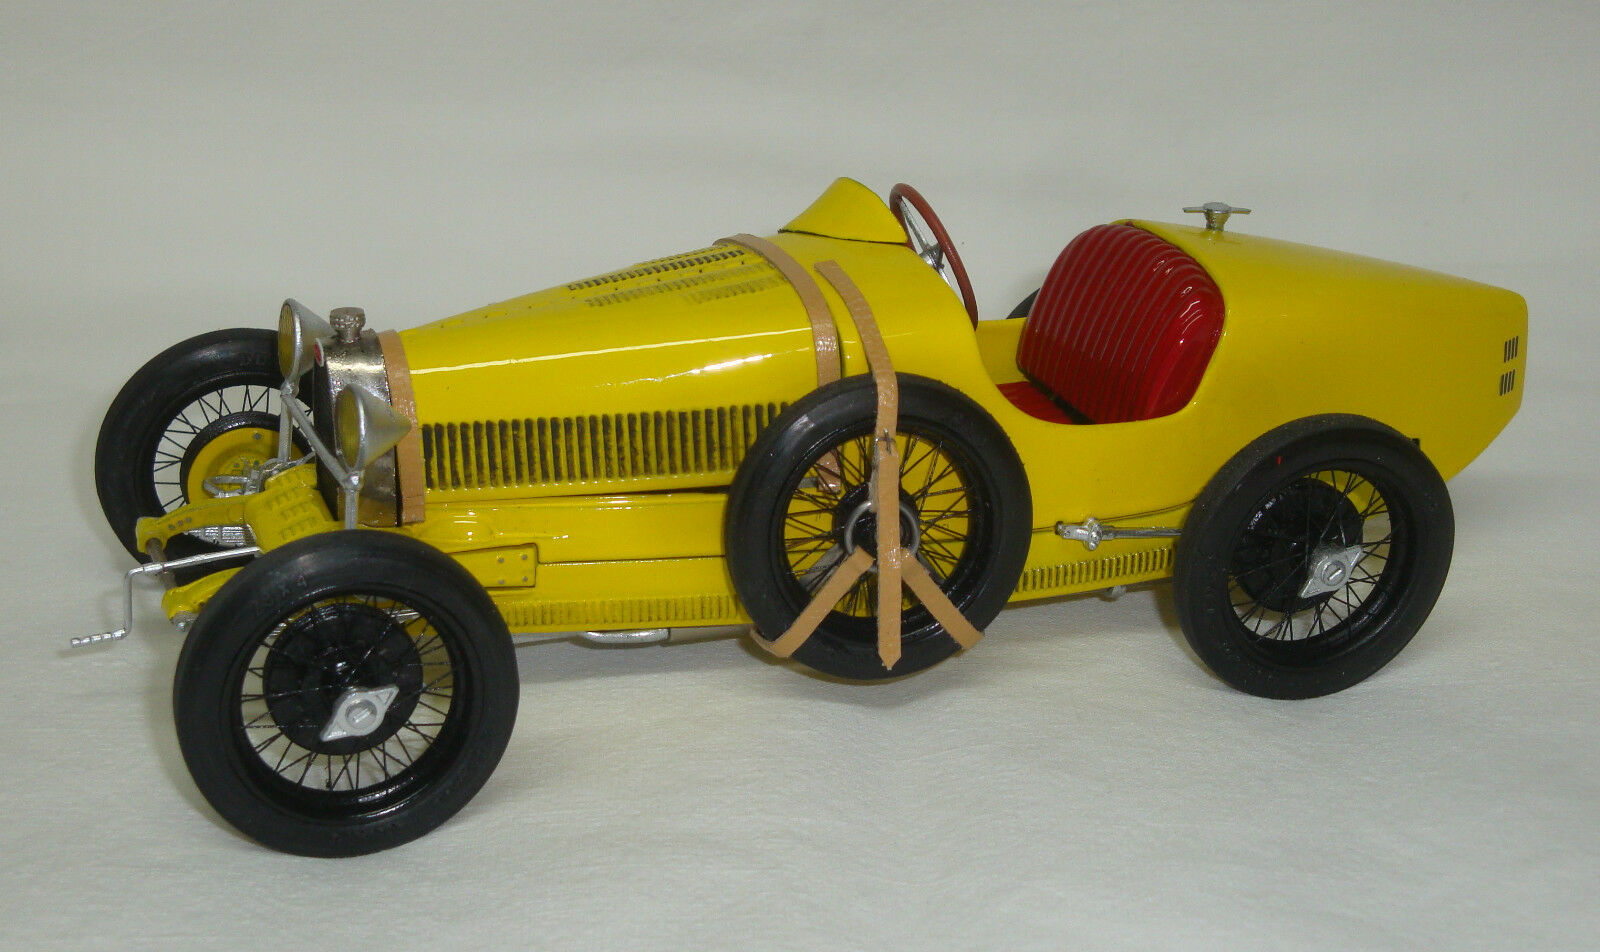 Bugatti tecla jaune-à la main modèle voiture miniature 1 20 revival-NEUF